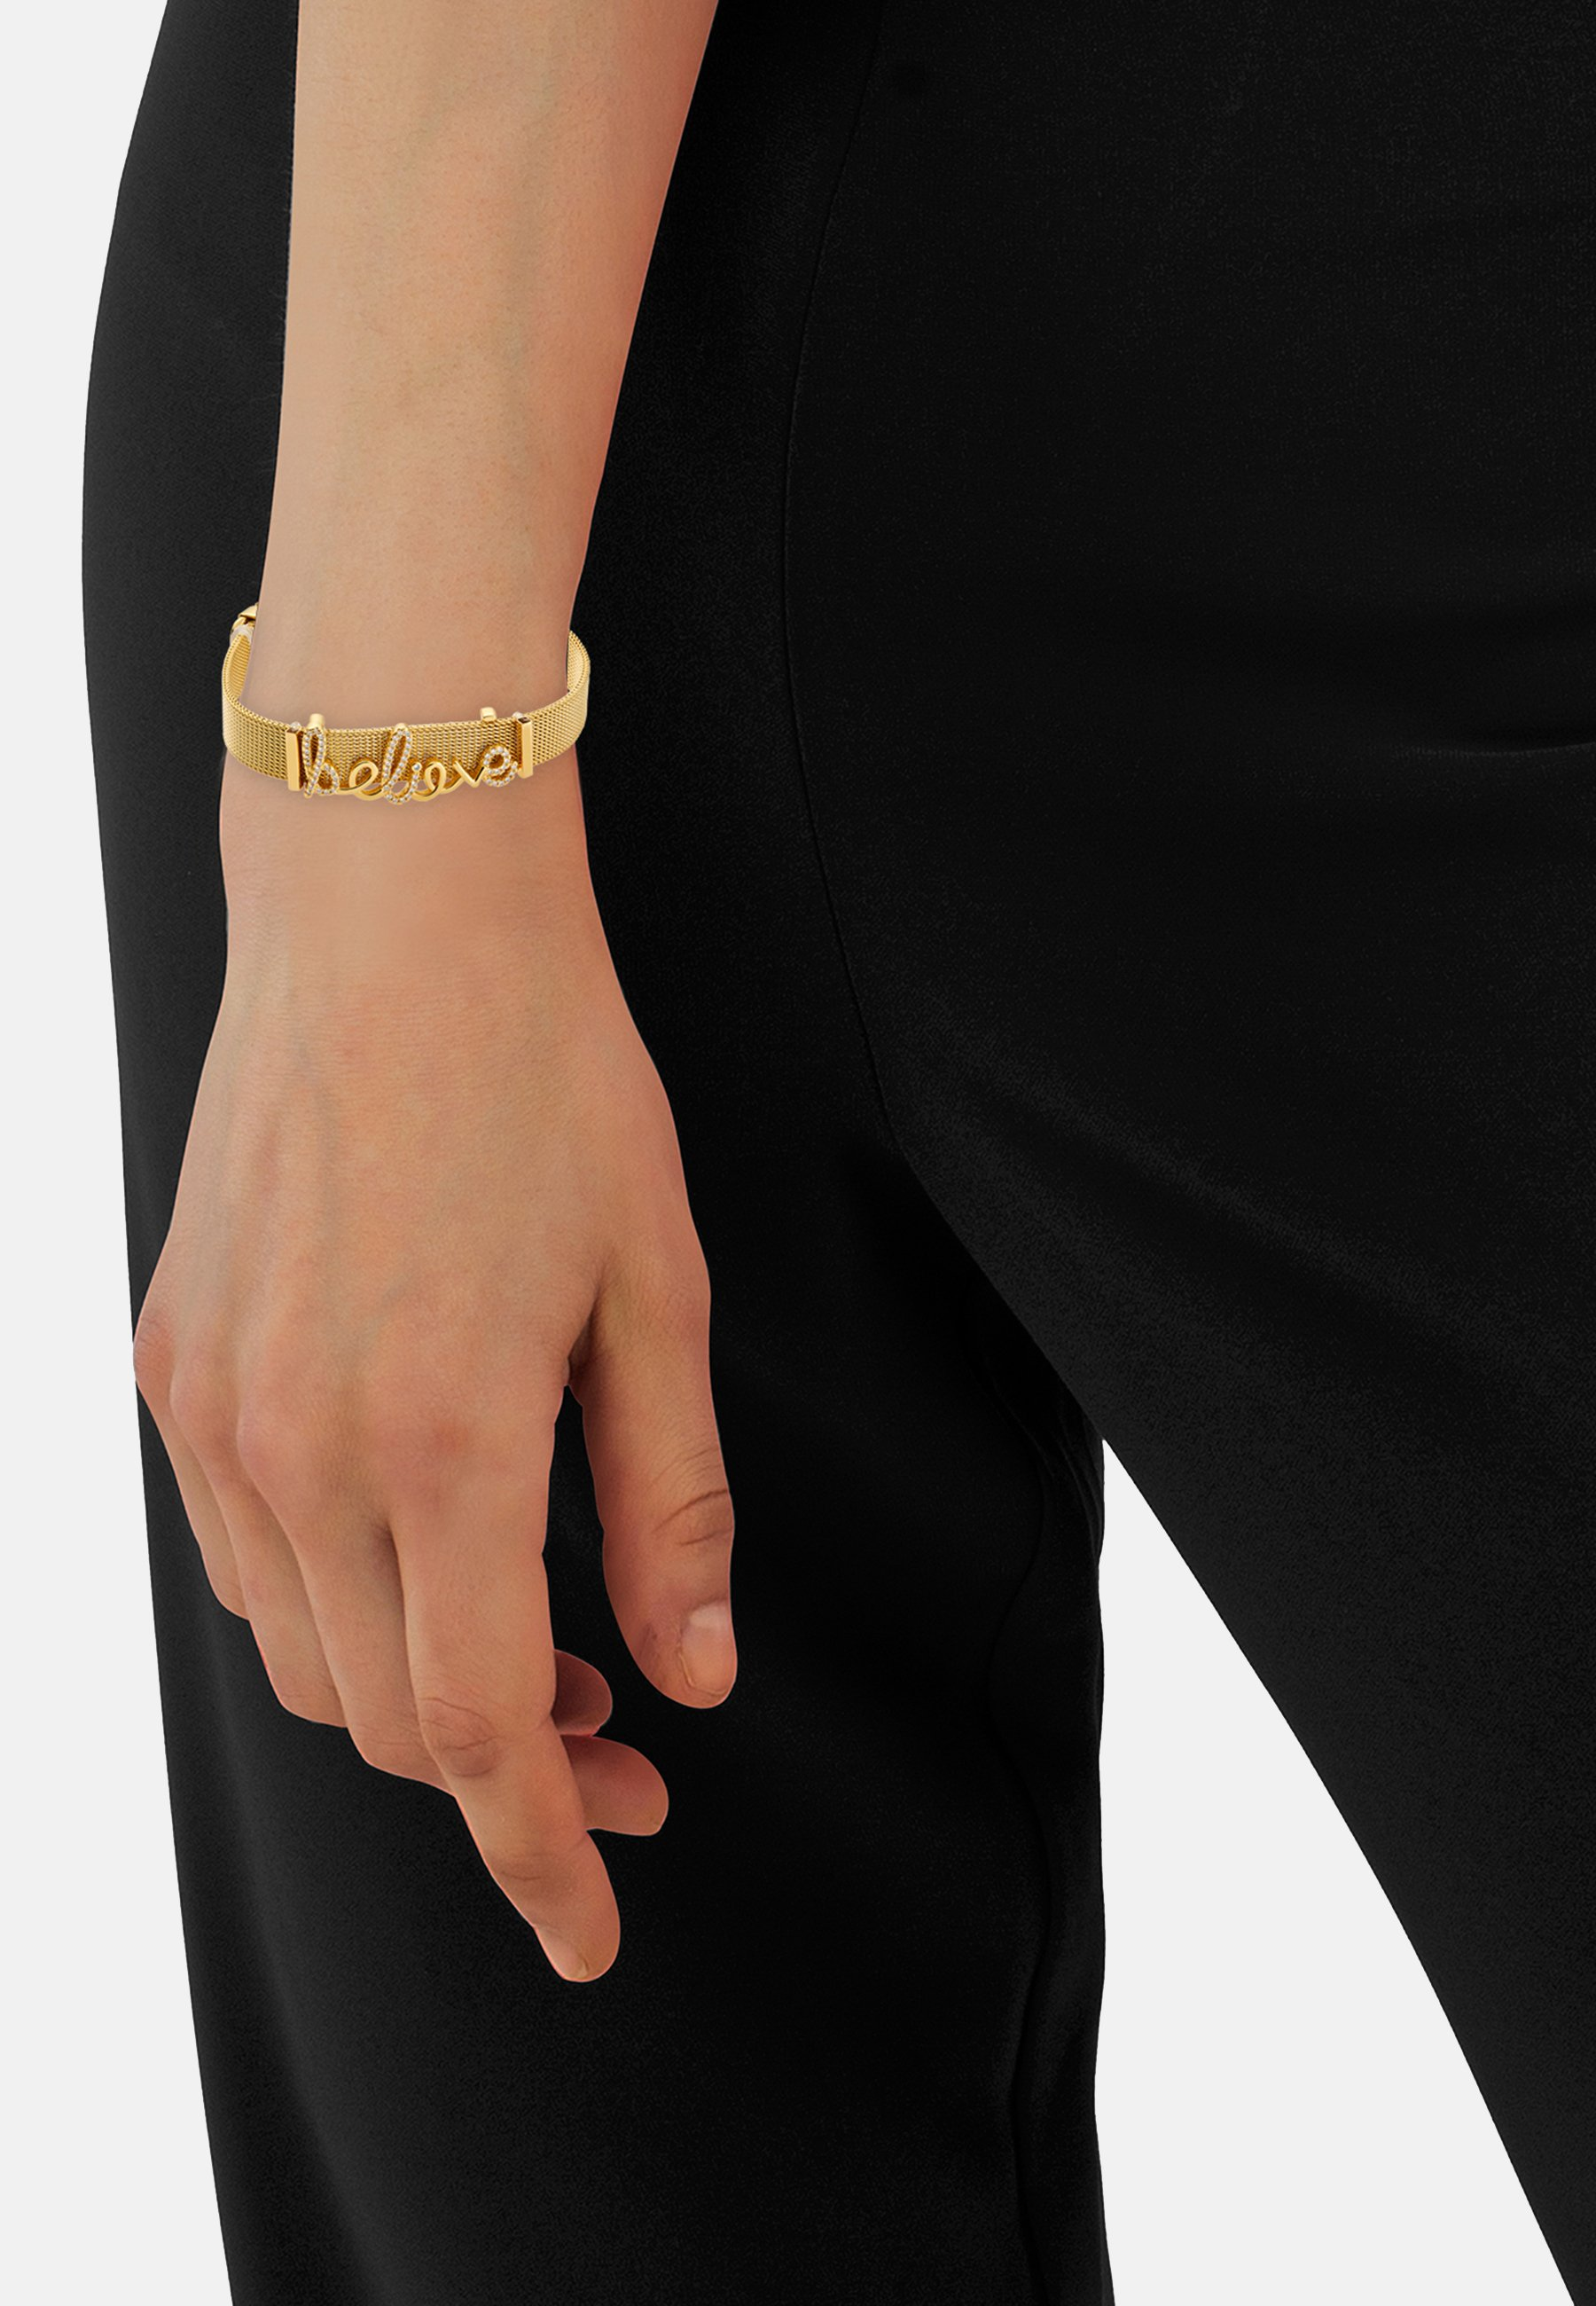 Femme ARMBAND BELIEVE - Bracelet